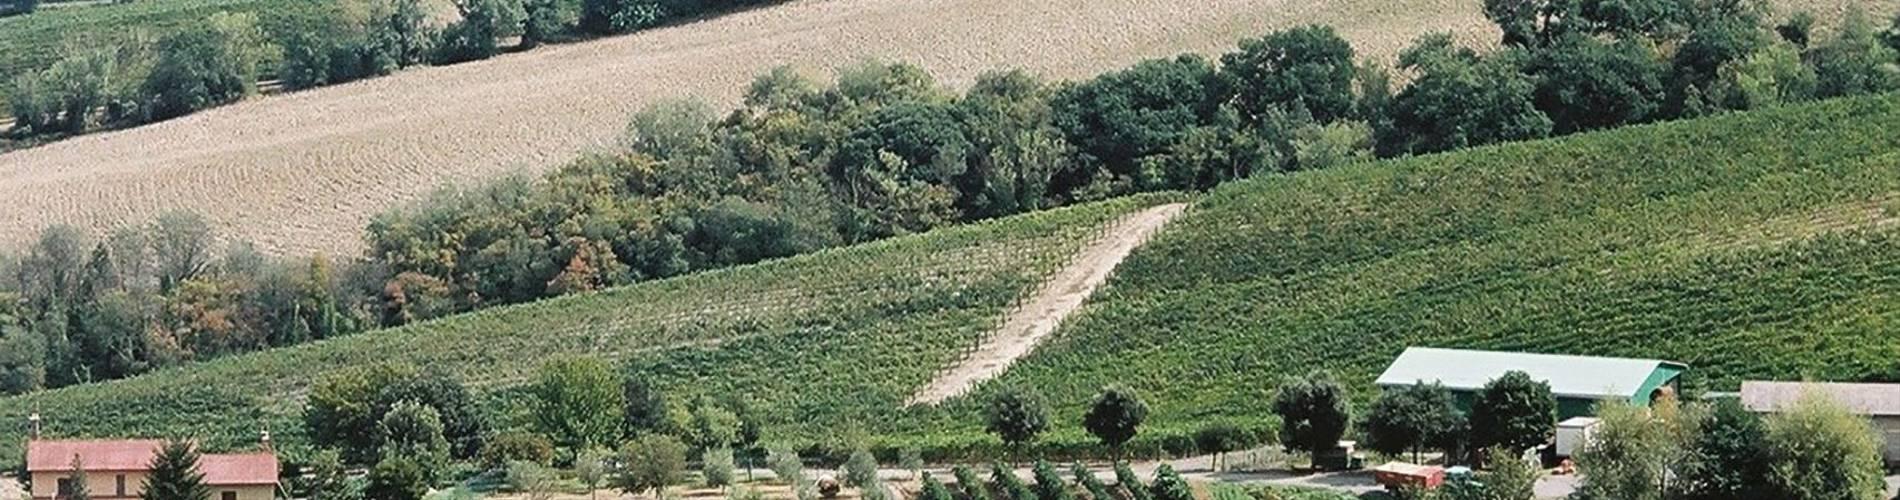 Locanda Palazzone, Umbria, Italy (7).JPG